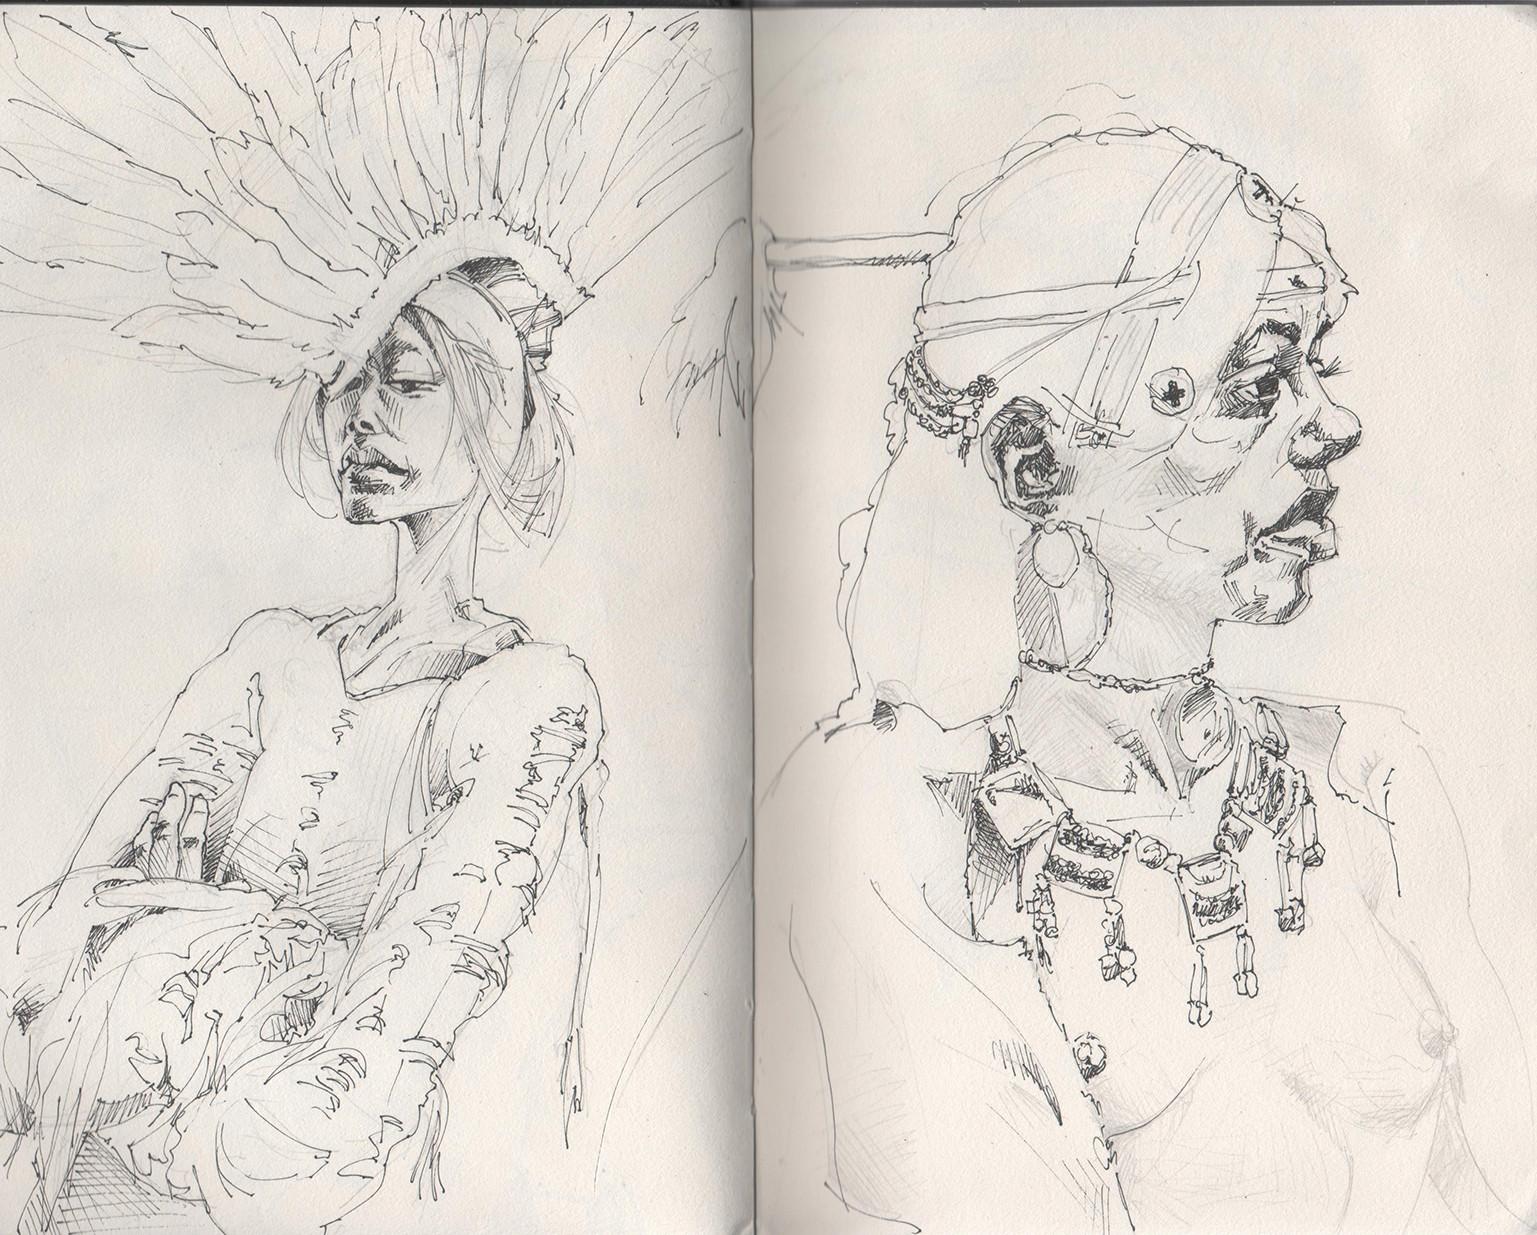 Tony gbeulie post sketch3